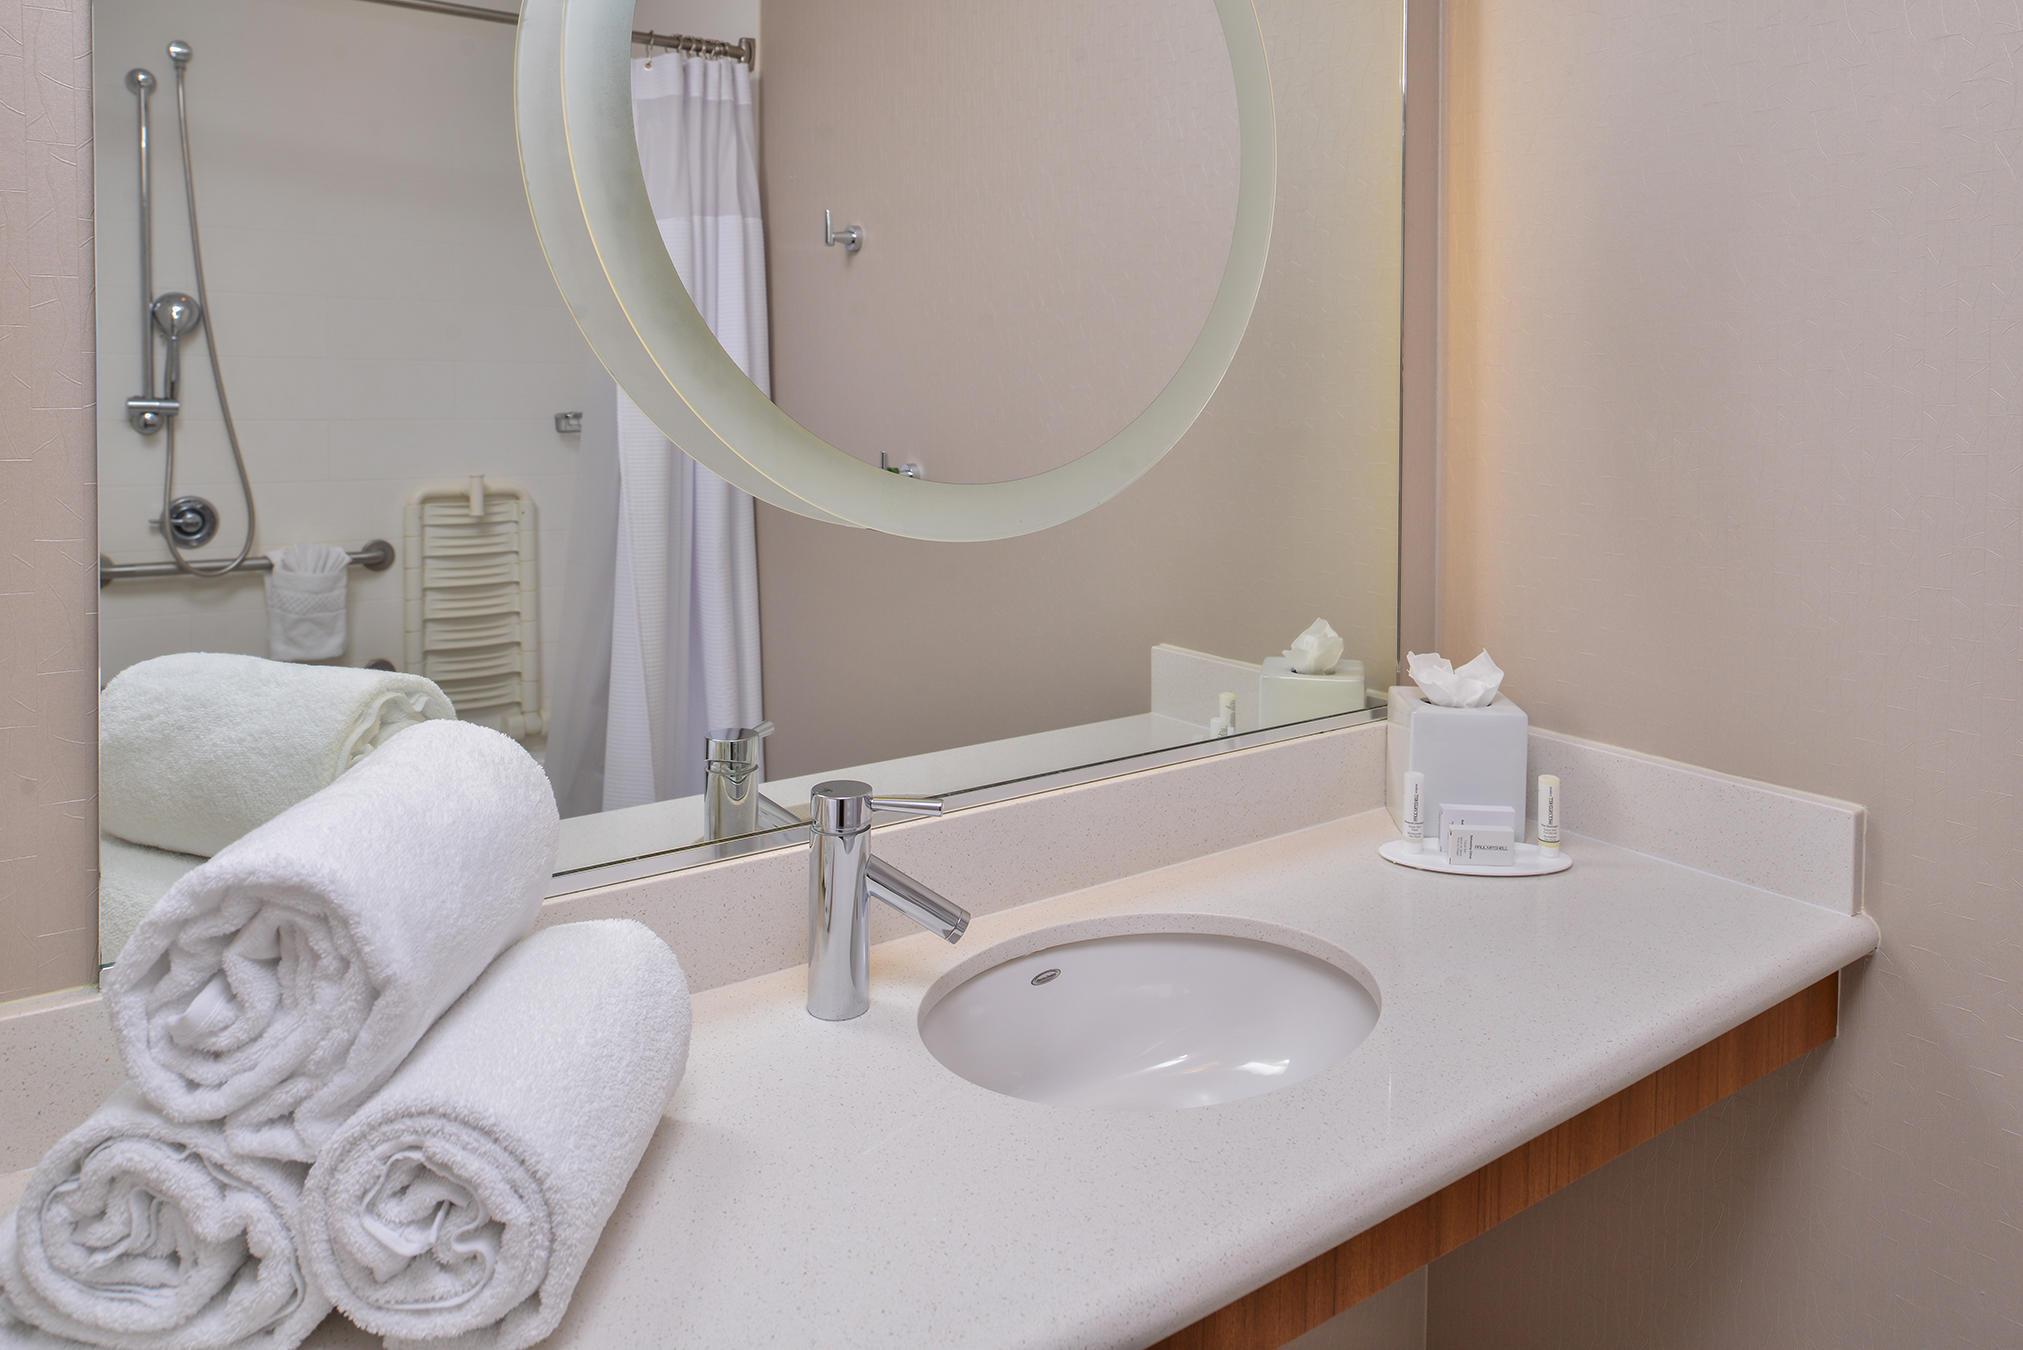 Springhill Suites By Marriott Irvine John Wayne Airport Orange County Irvine California Ca